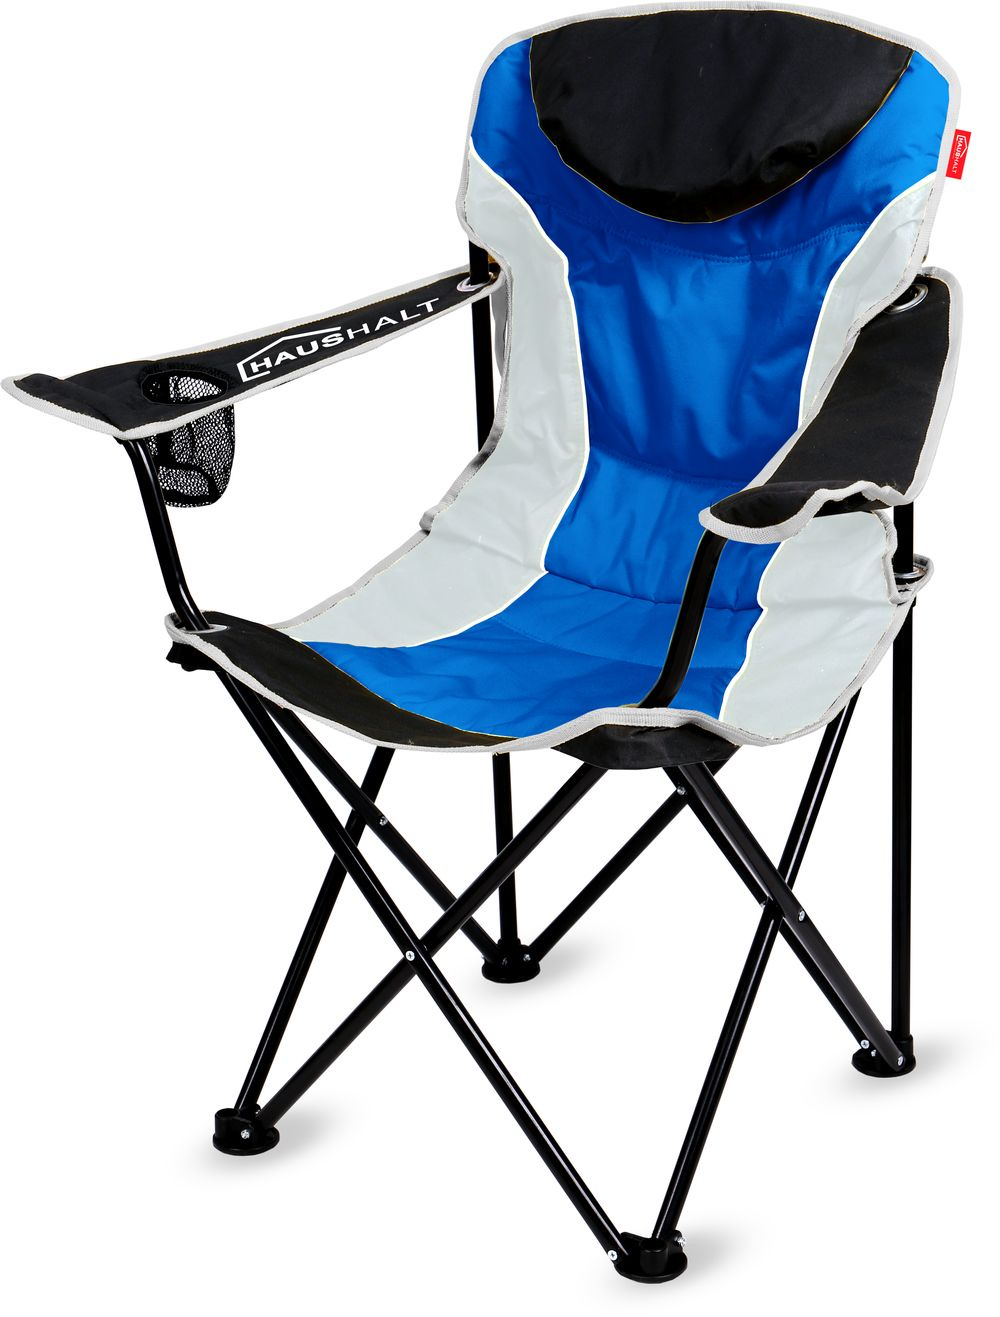 Стул складной Haushalt HHC3/B синий стул складной 400х300х300 мм